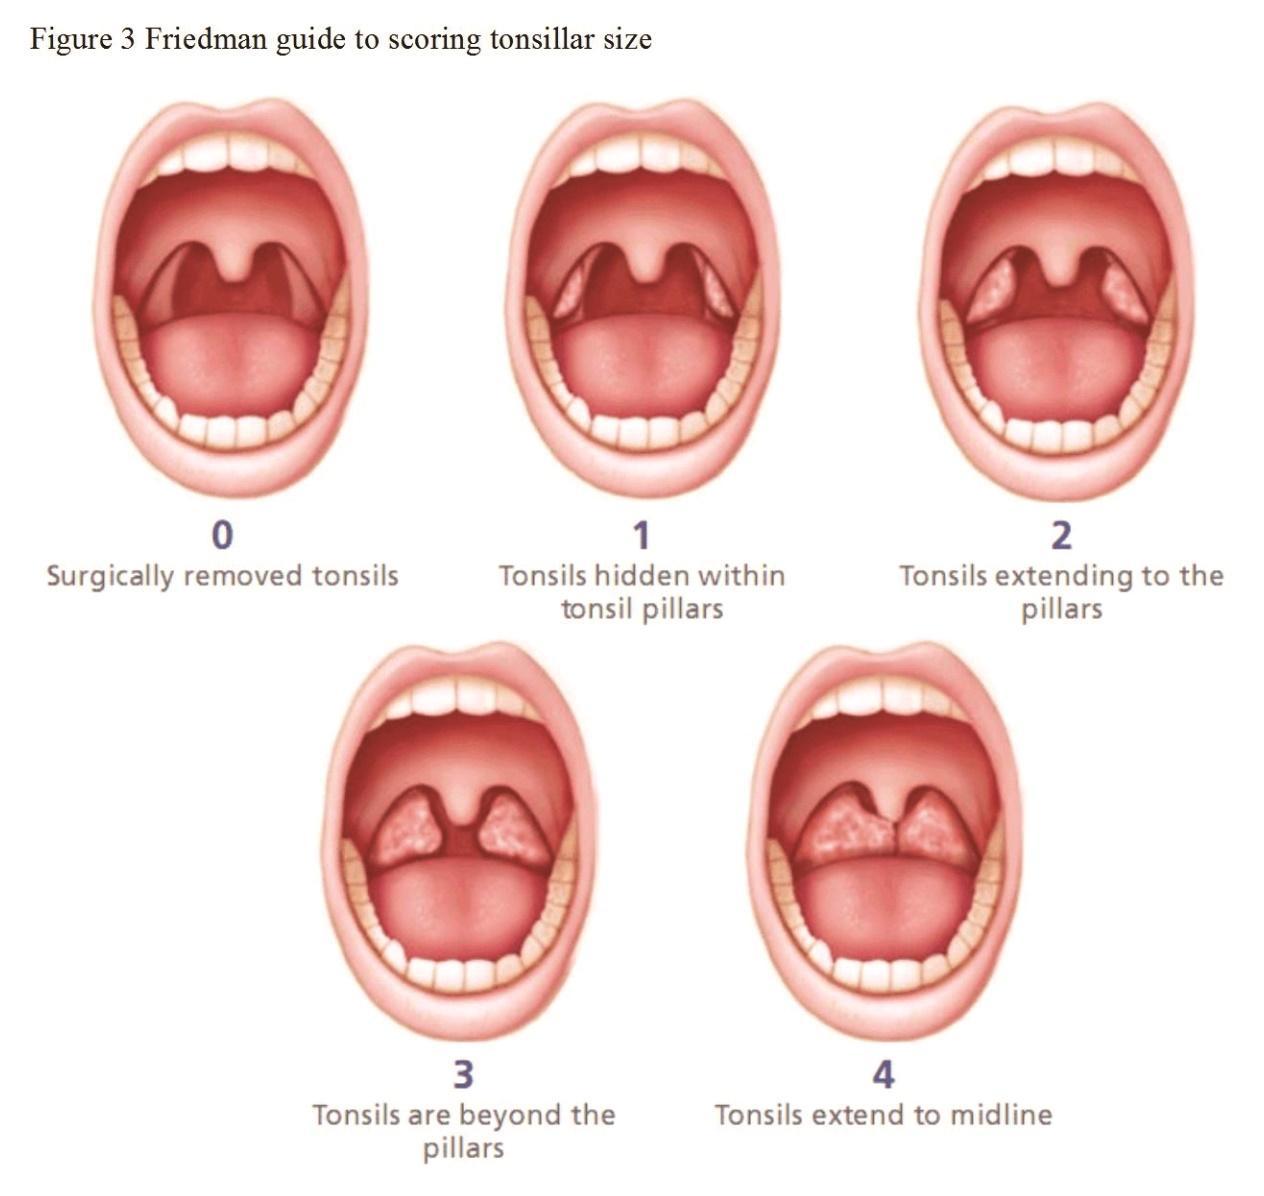 Current Strategies For Adenotonsillar Infection Hyperplasia